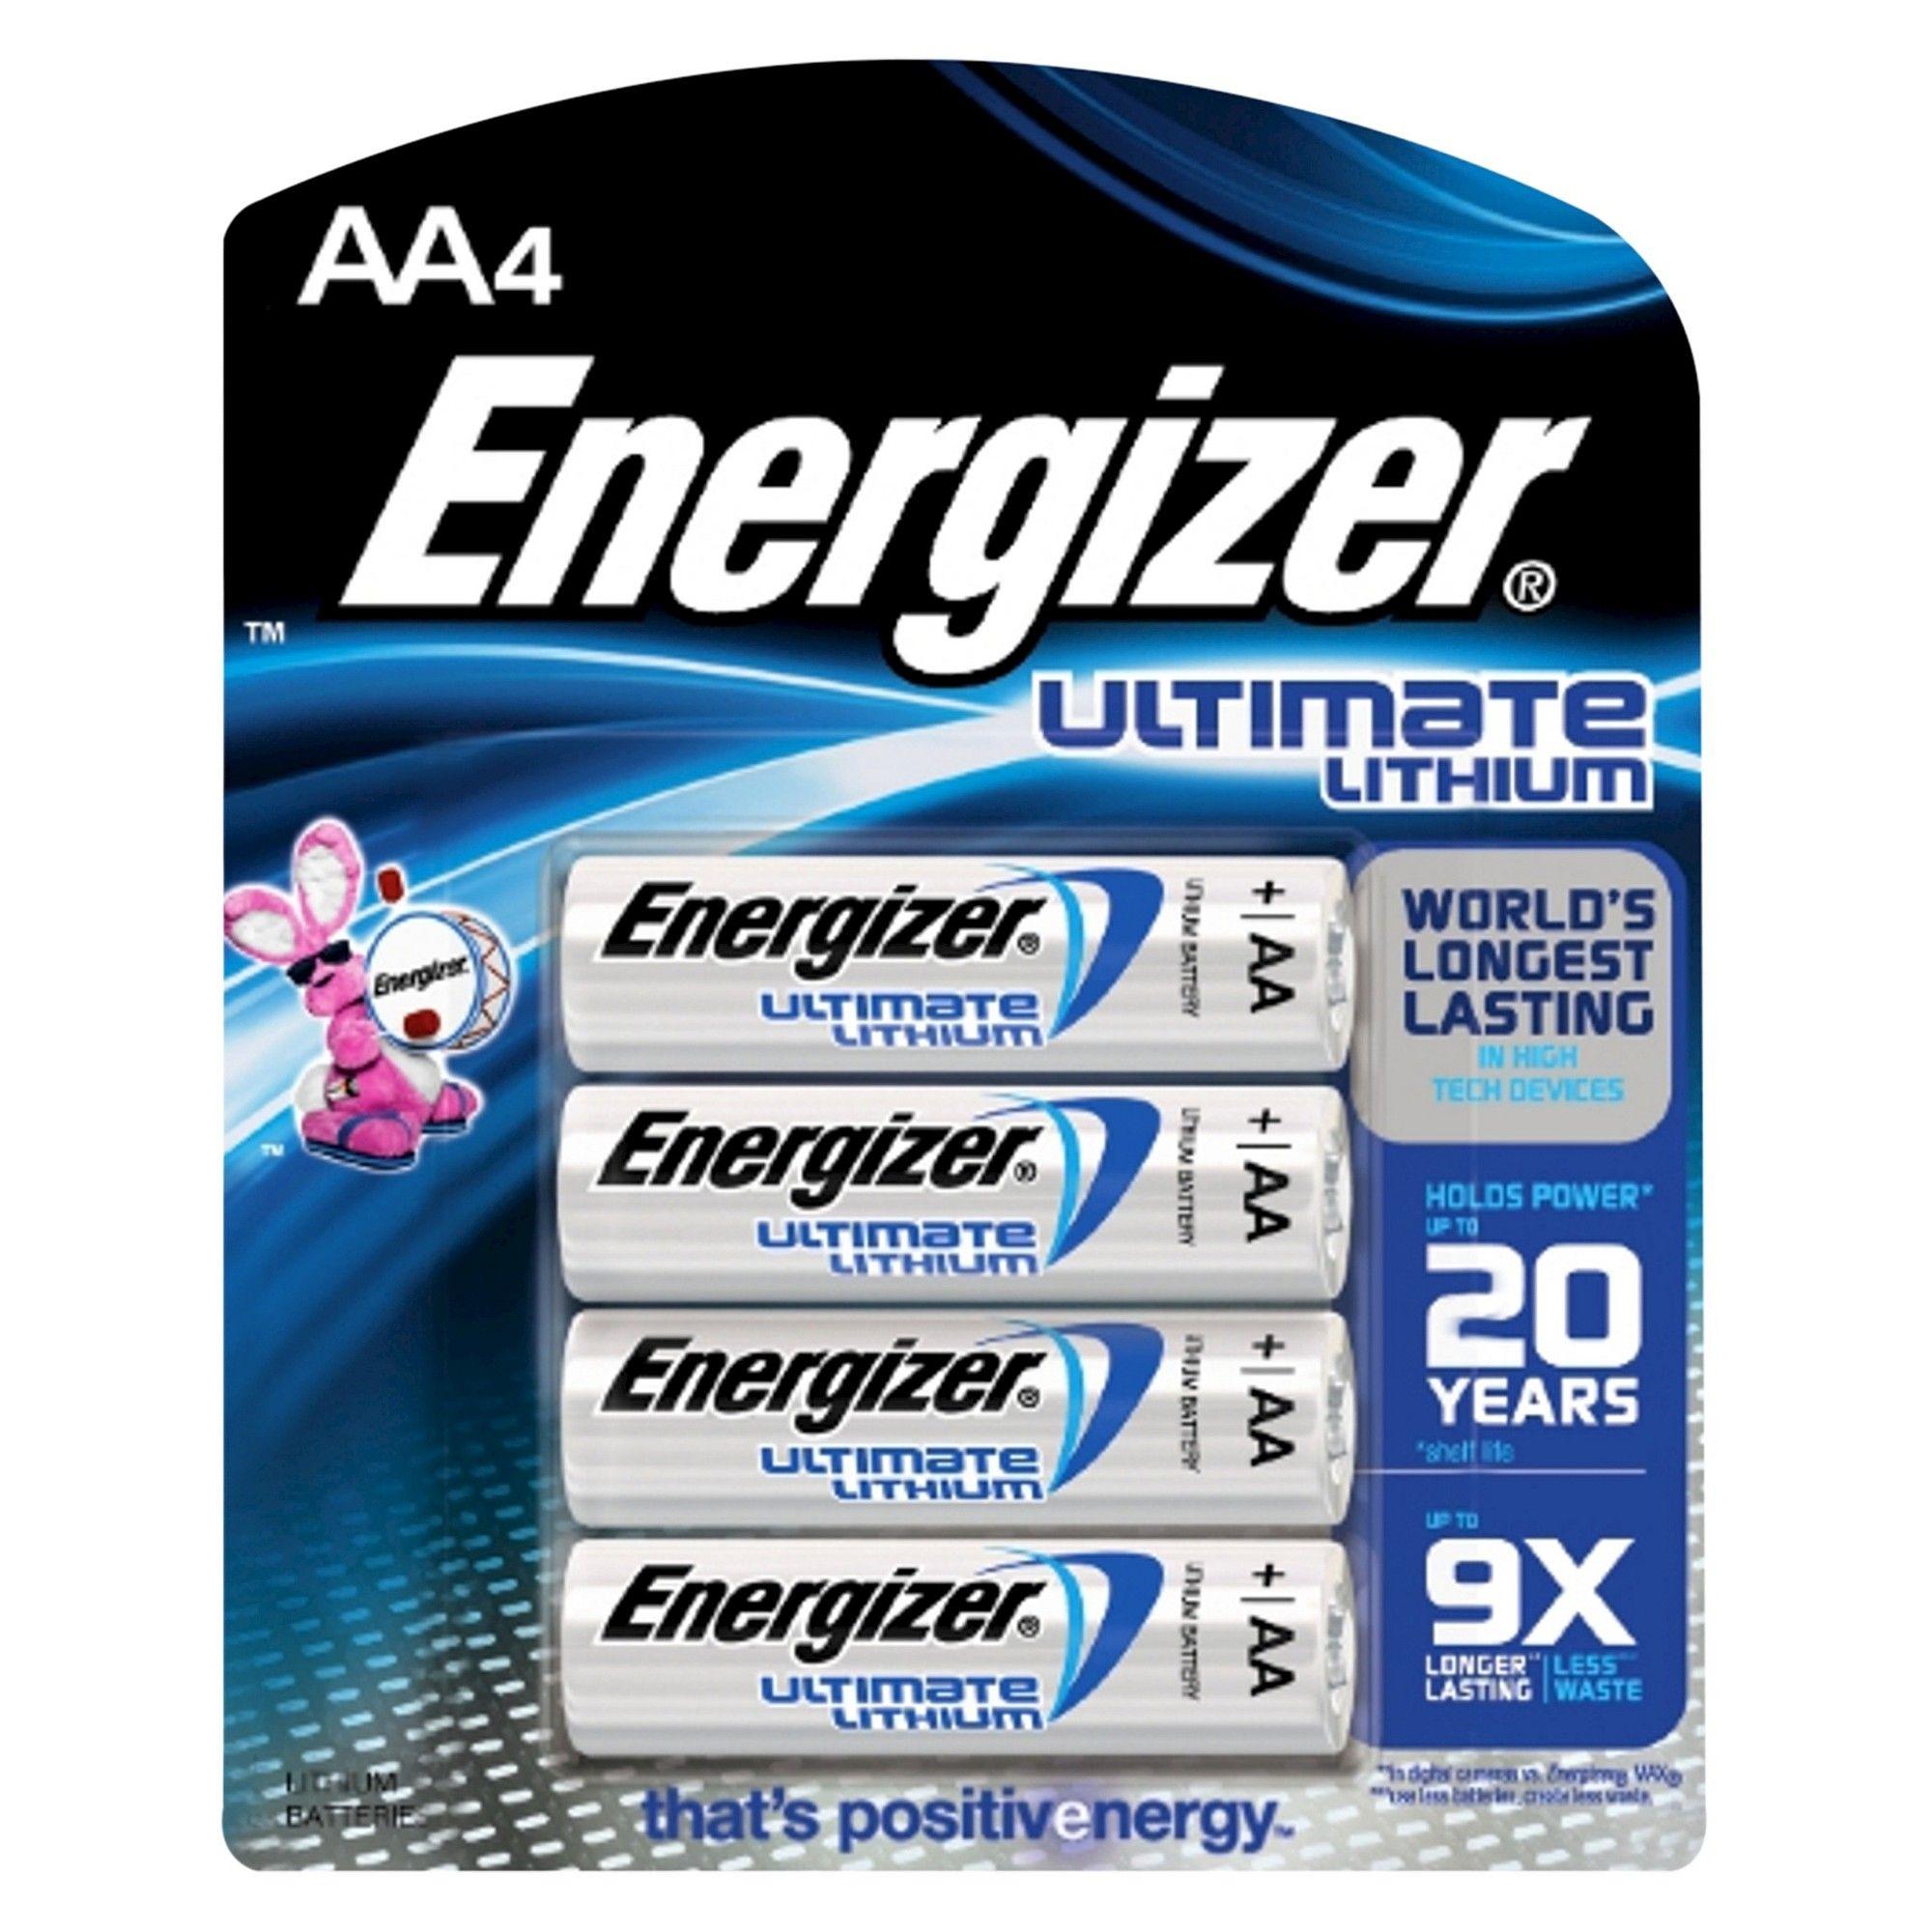 Energizer 4pk Ultimate Lithium Aa Batteries Energizer Energizer Battery Batteries